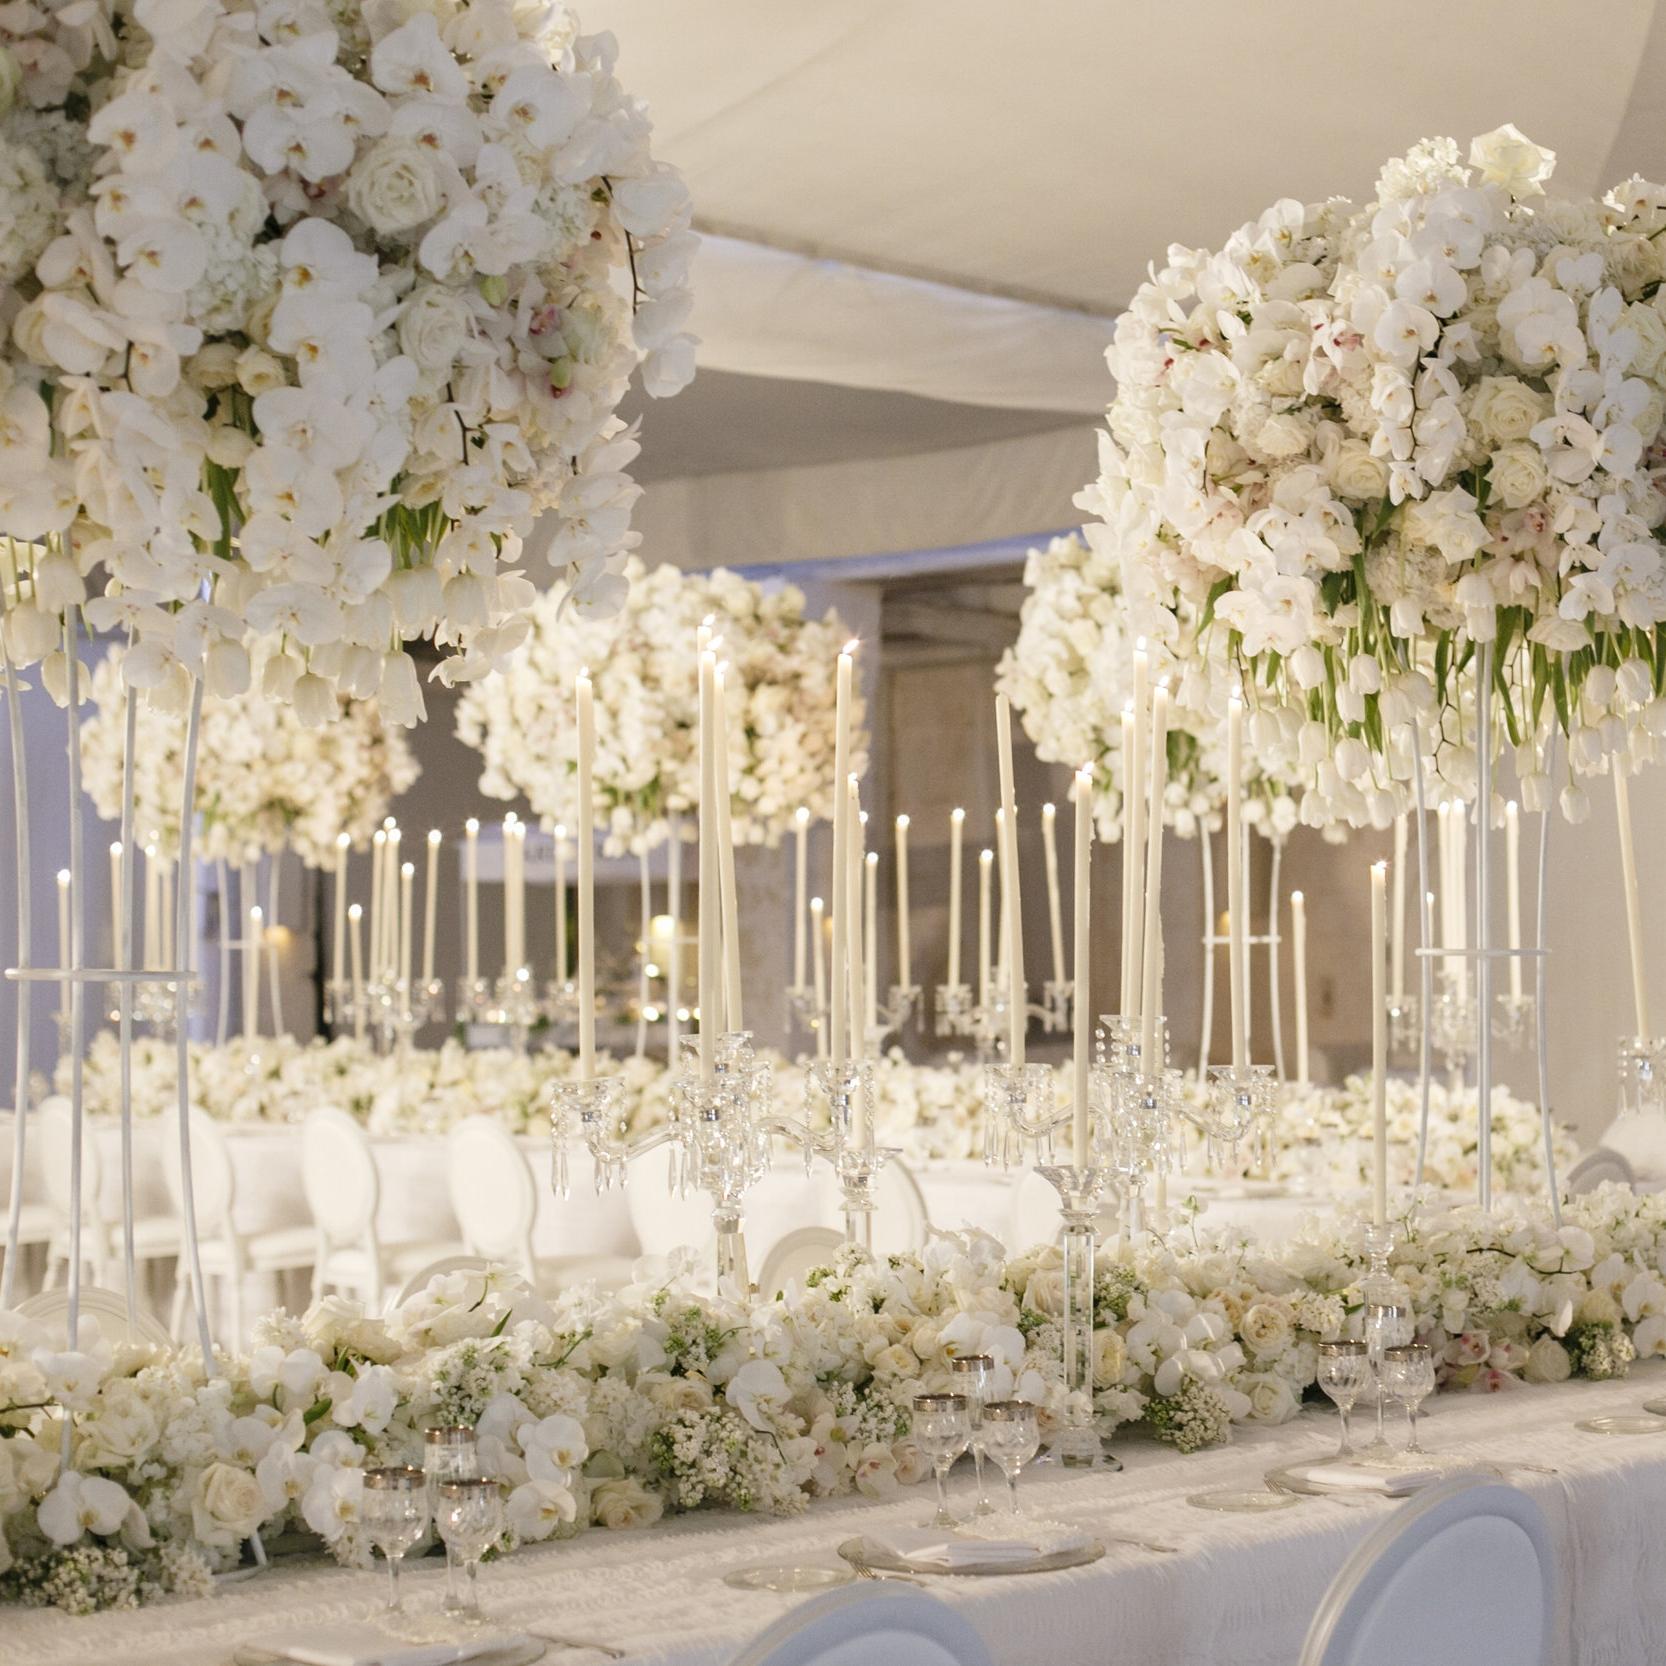 destination_weddings_event_planning_services.jpg